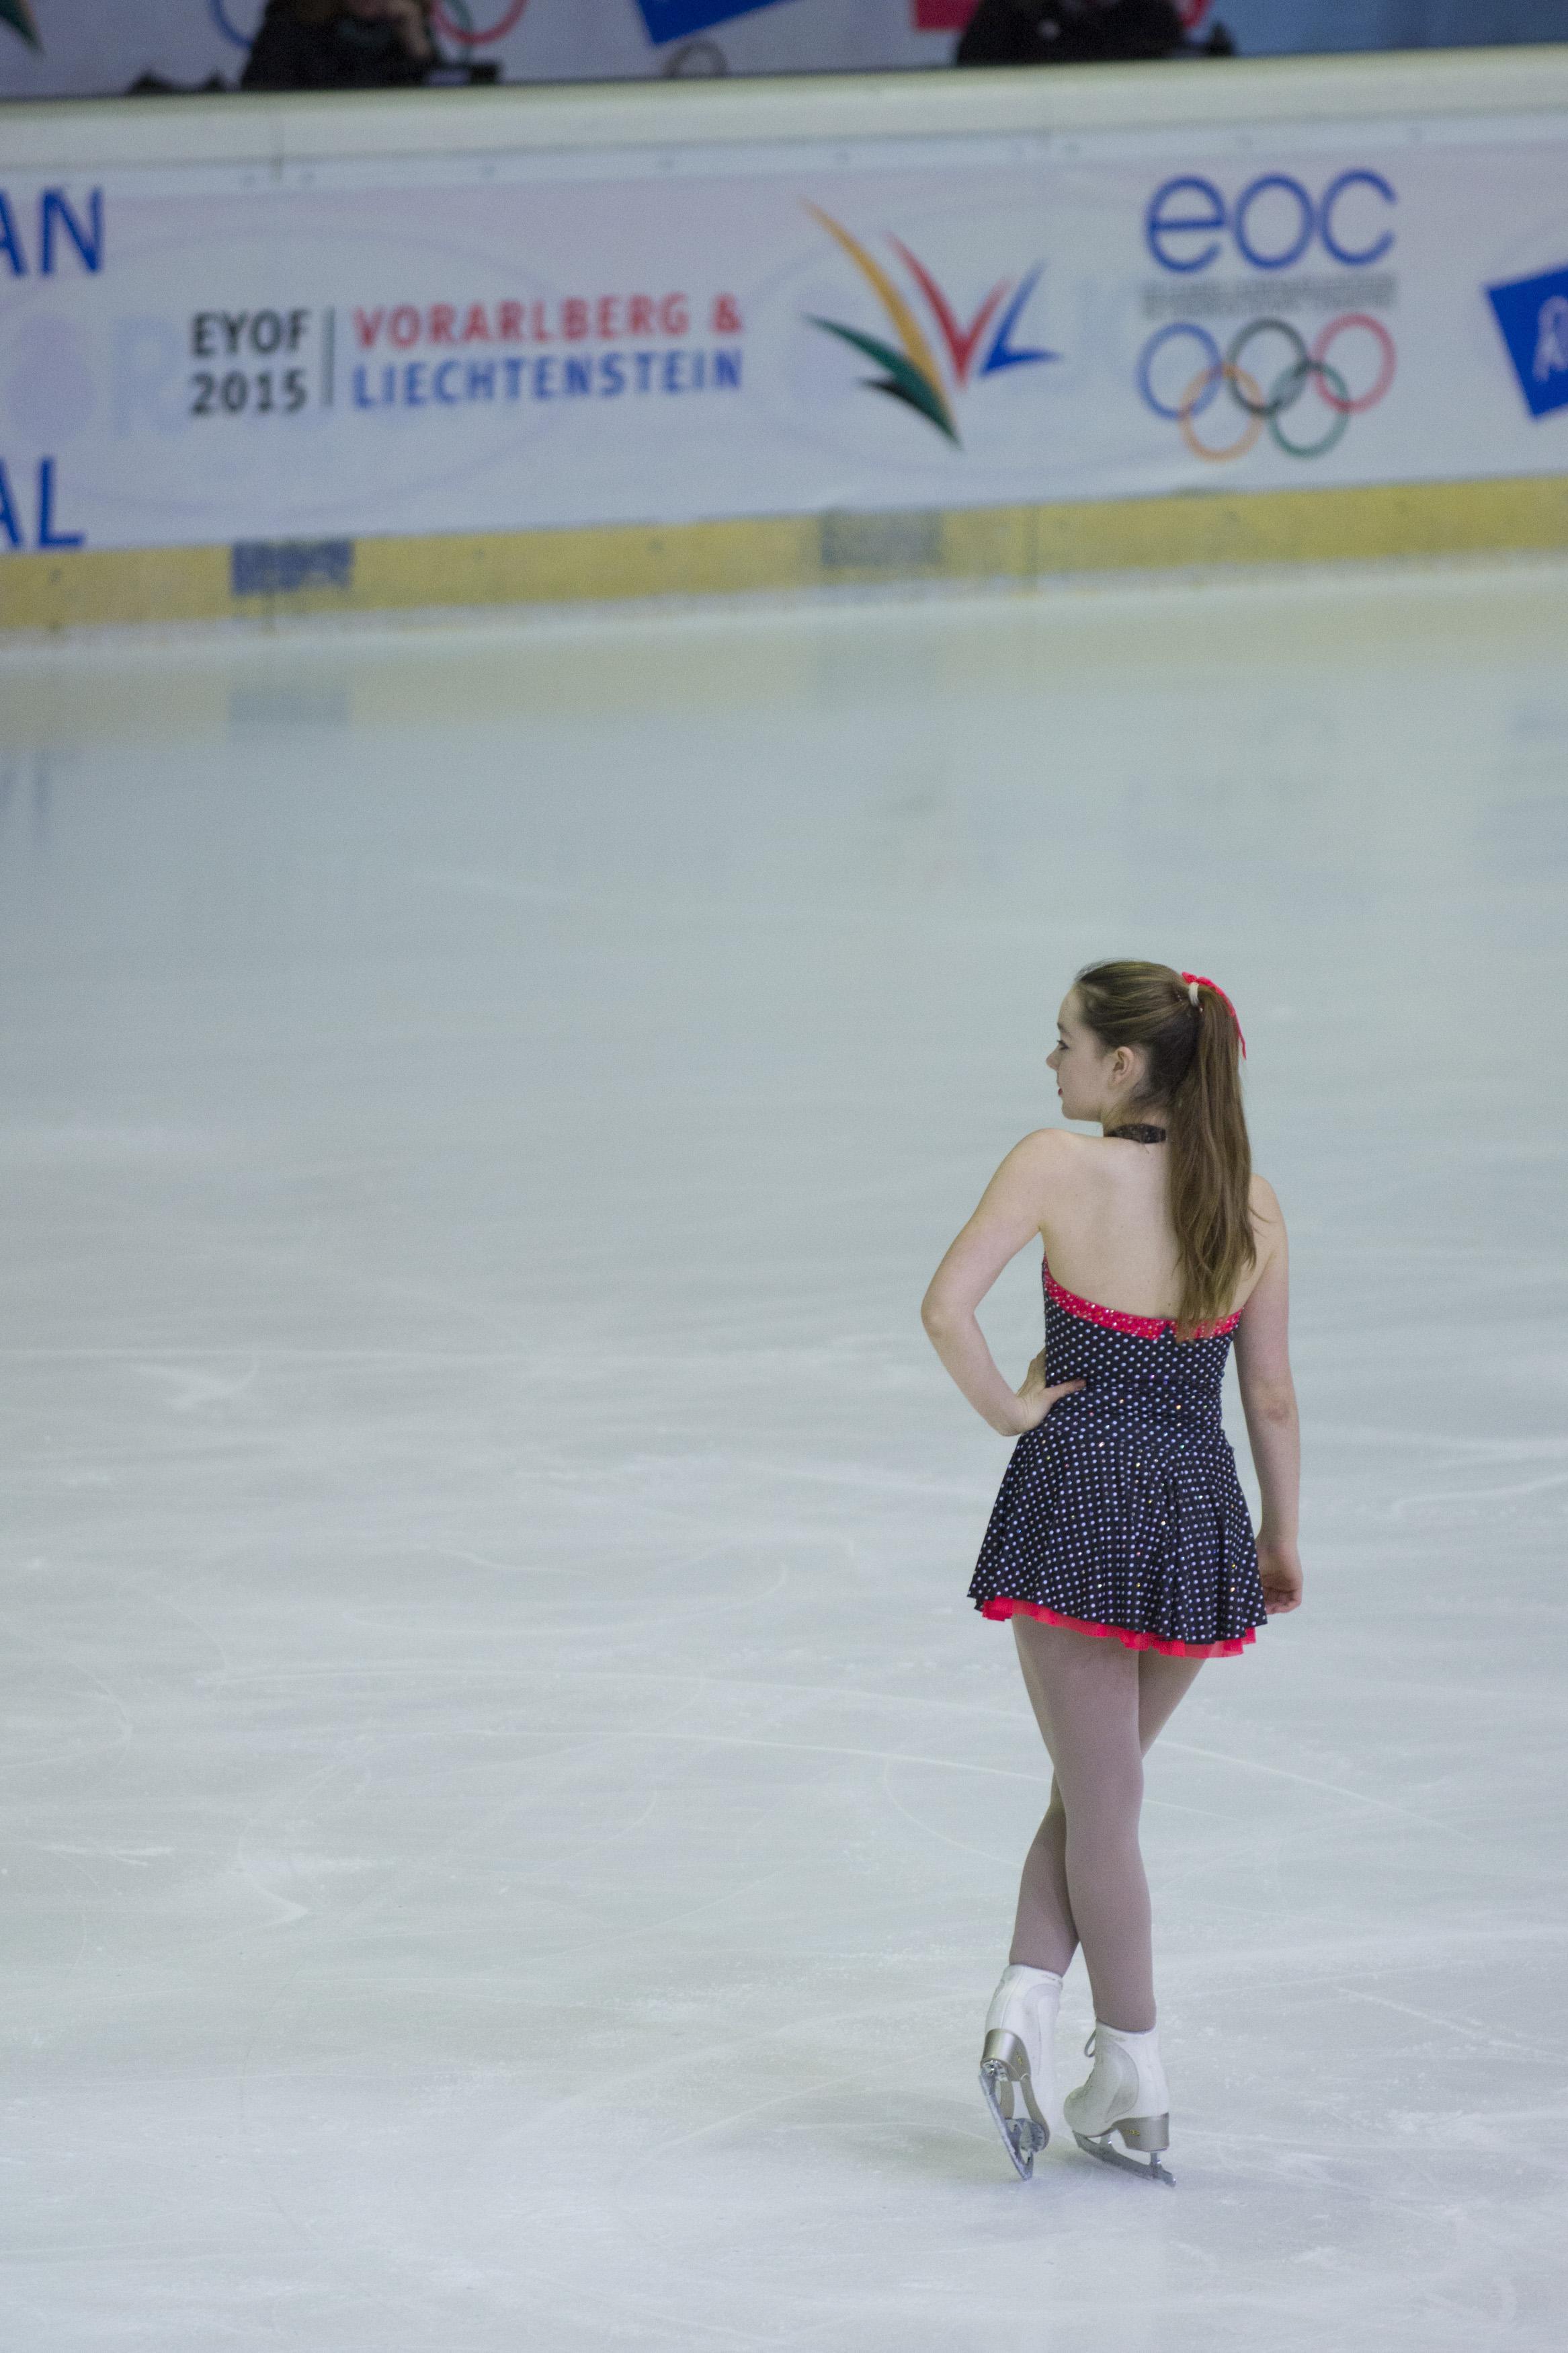 EYOF_20150126_DB_FigureSkating_GirlsShort_065.jpg